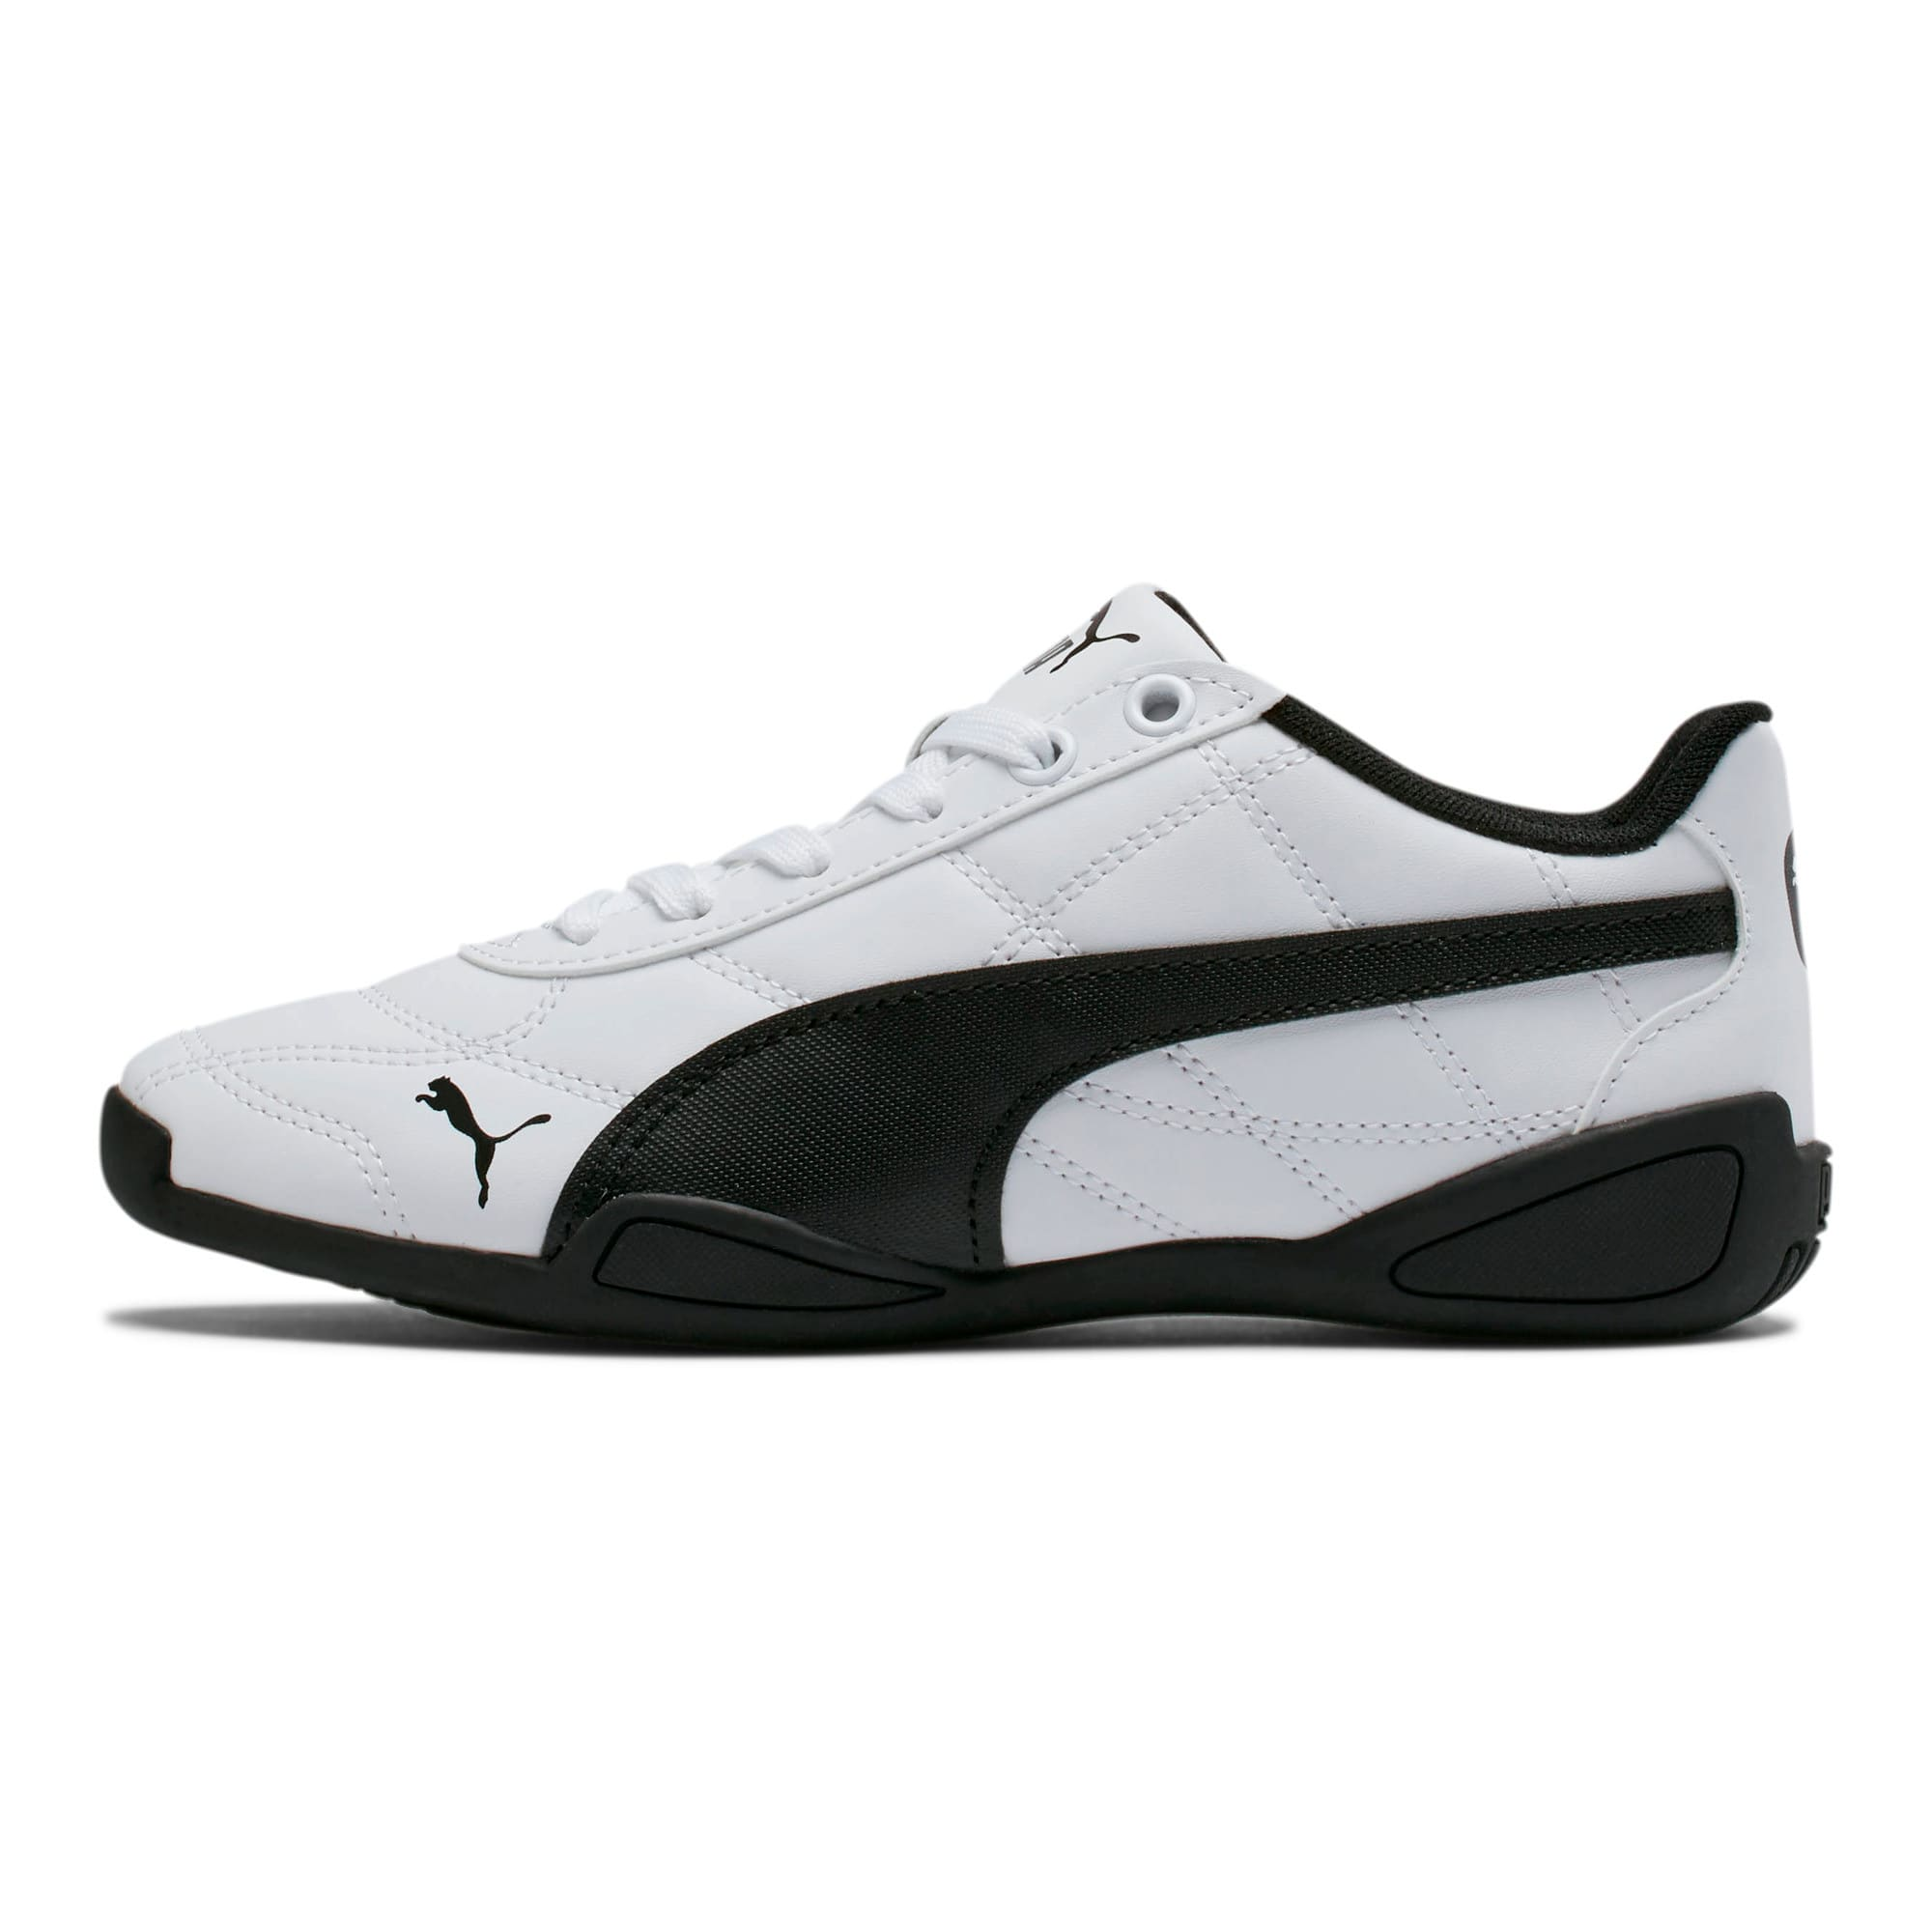 Thumbnail 1 of Tune Cat 3 Shoes JR, Puma White-Puma Black, medium